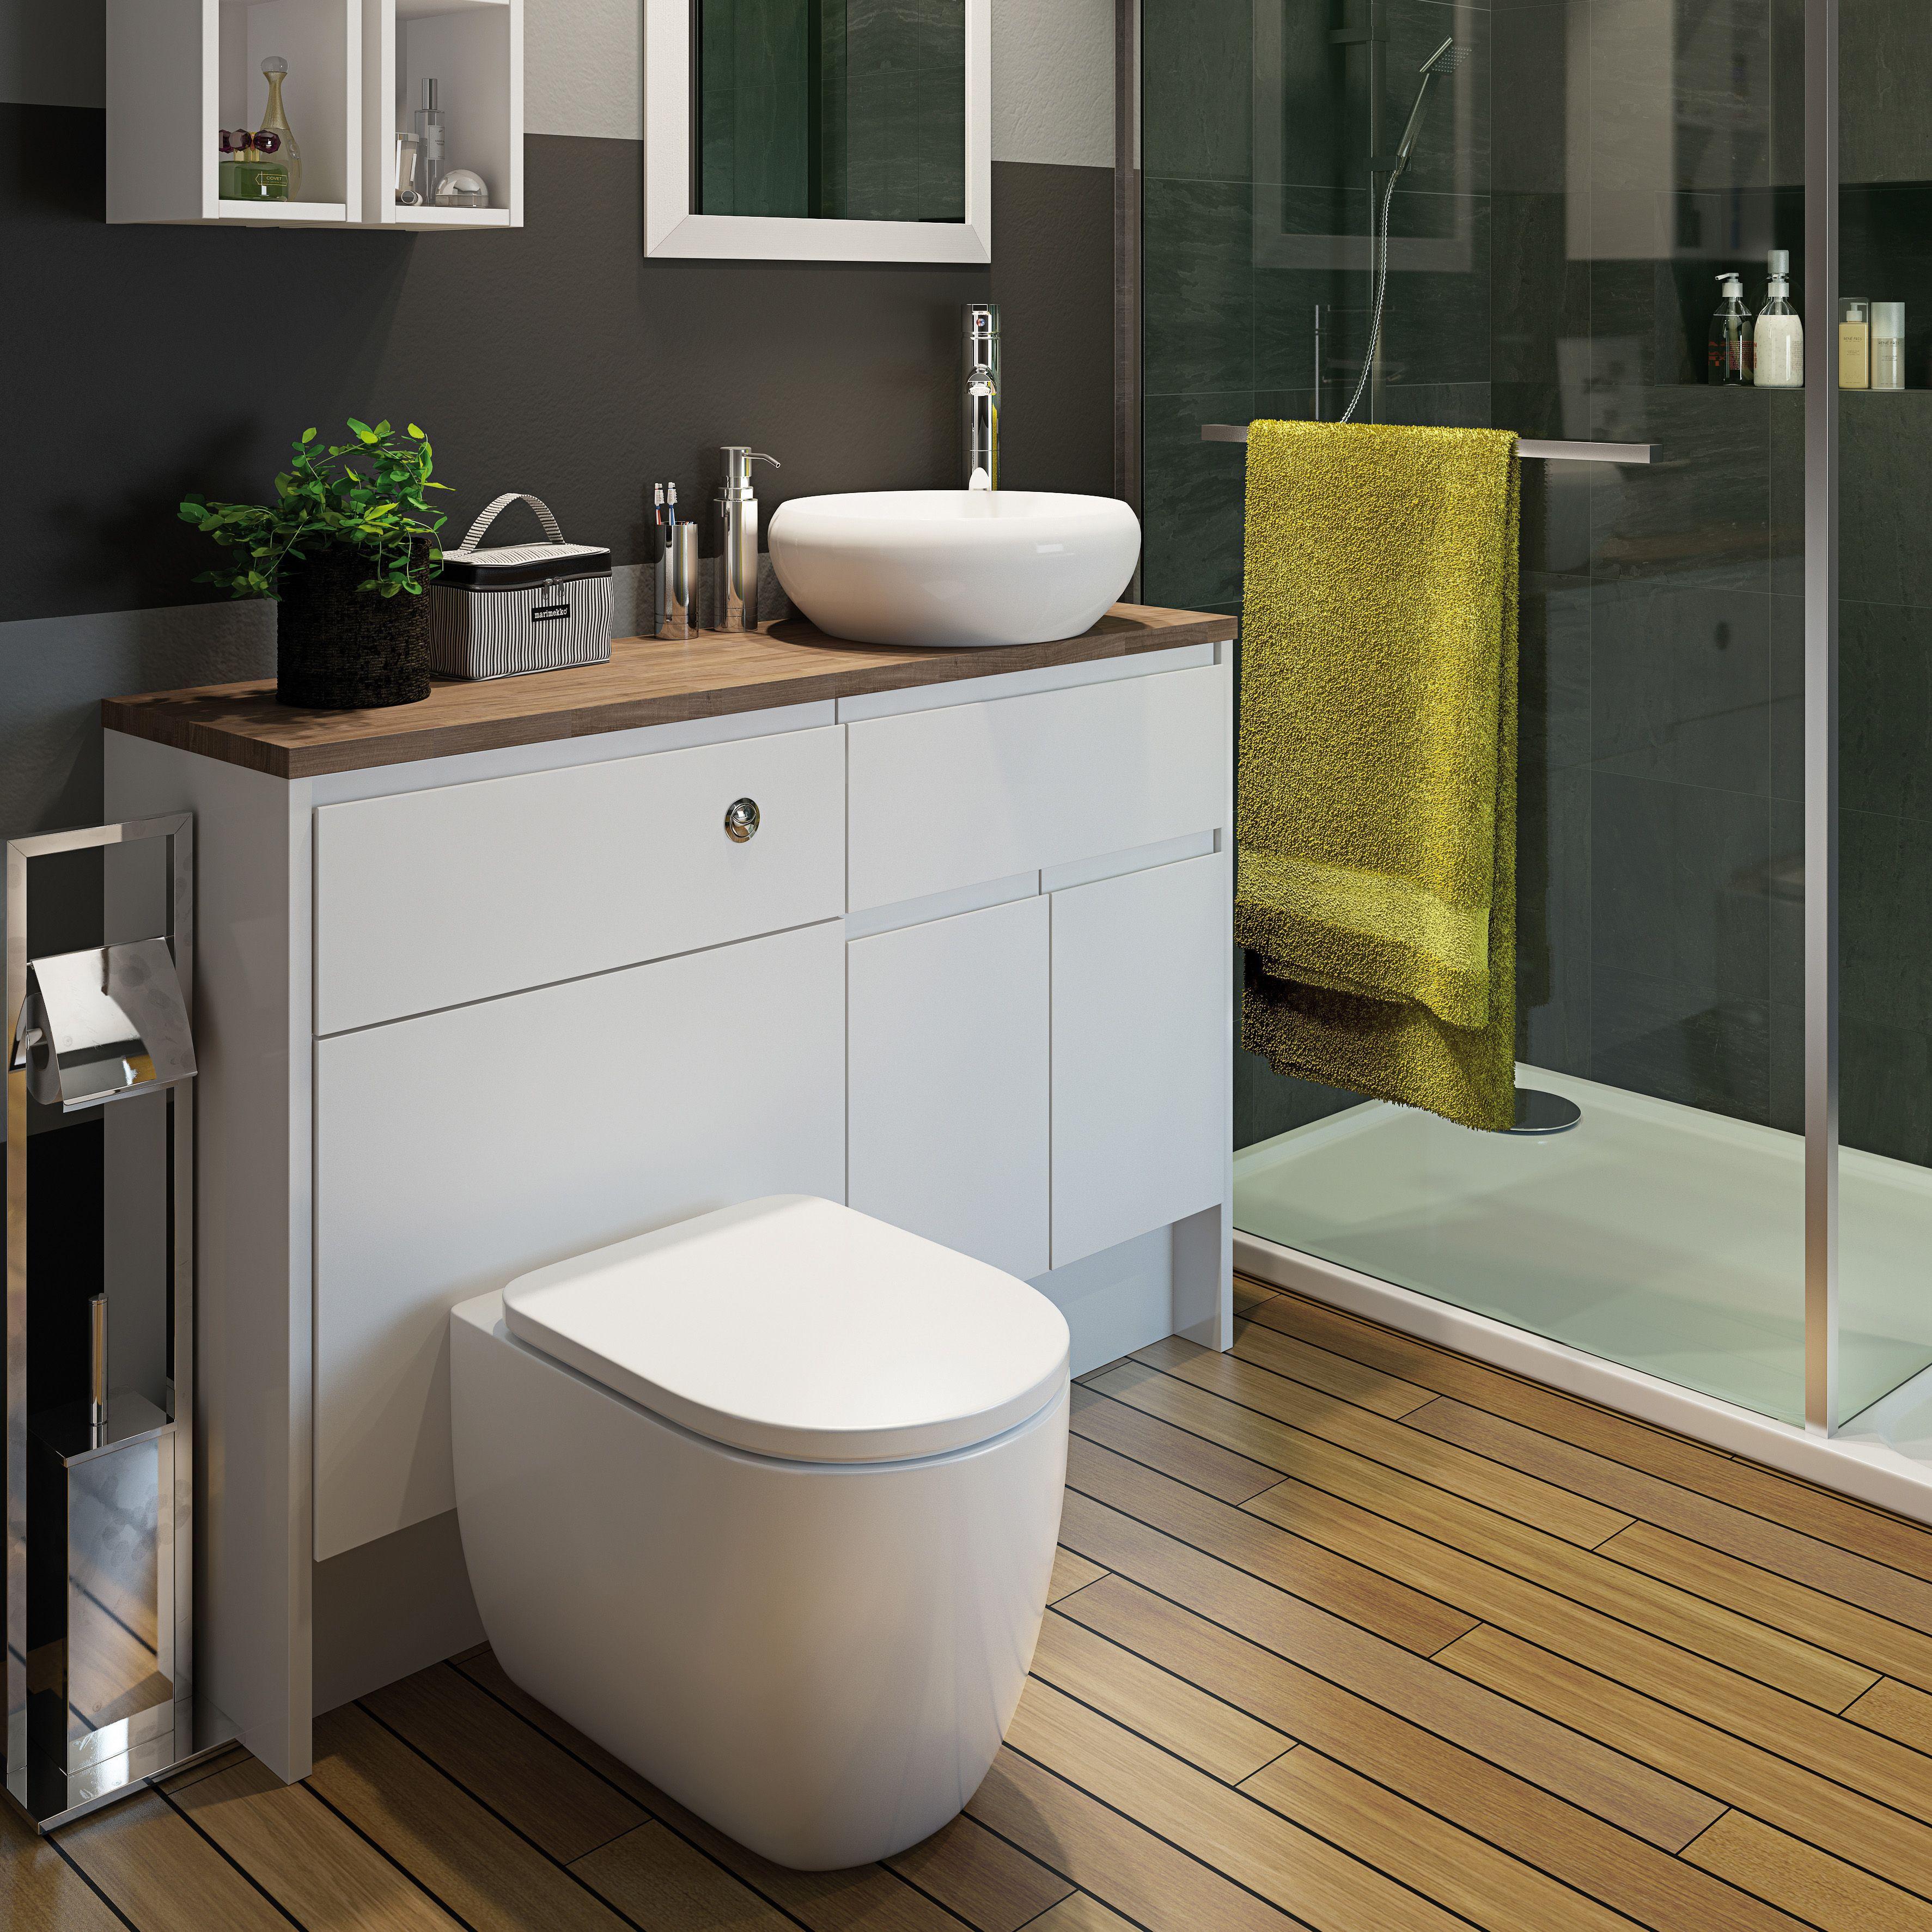 Cooke Lewis Marletti Gloss White Slimline Basin Unit W 600mm H 852mm In 2020 Small Bathroom Small Toilet Basin Unit